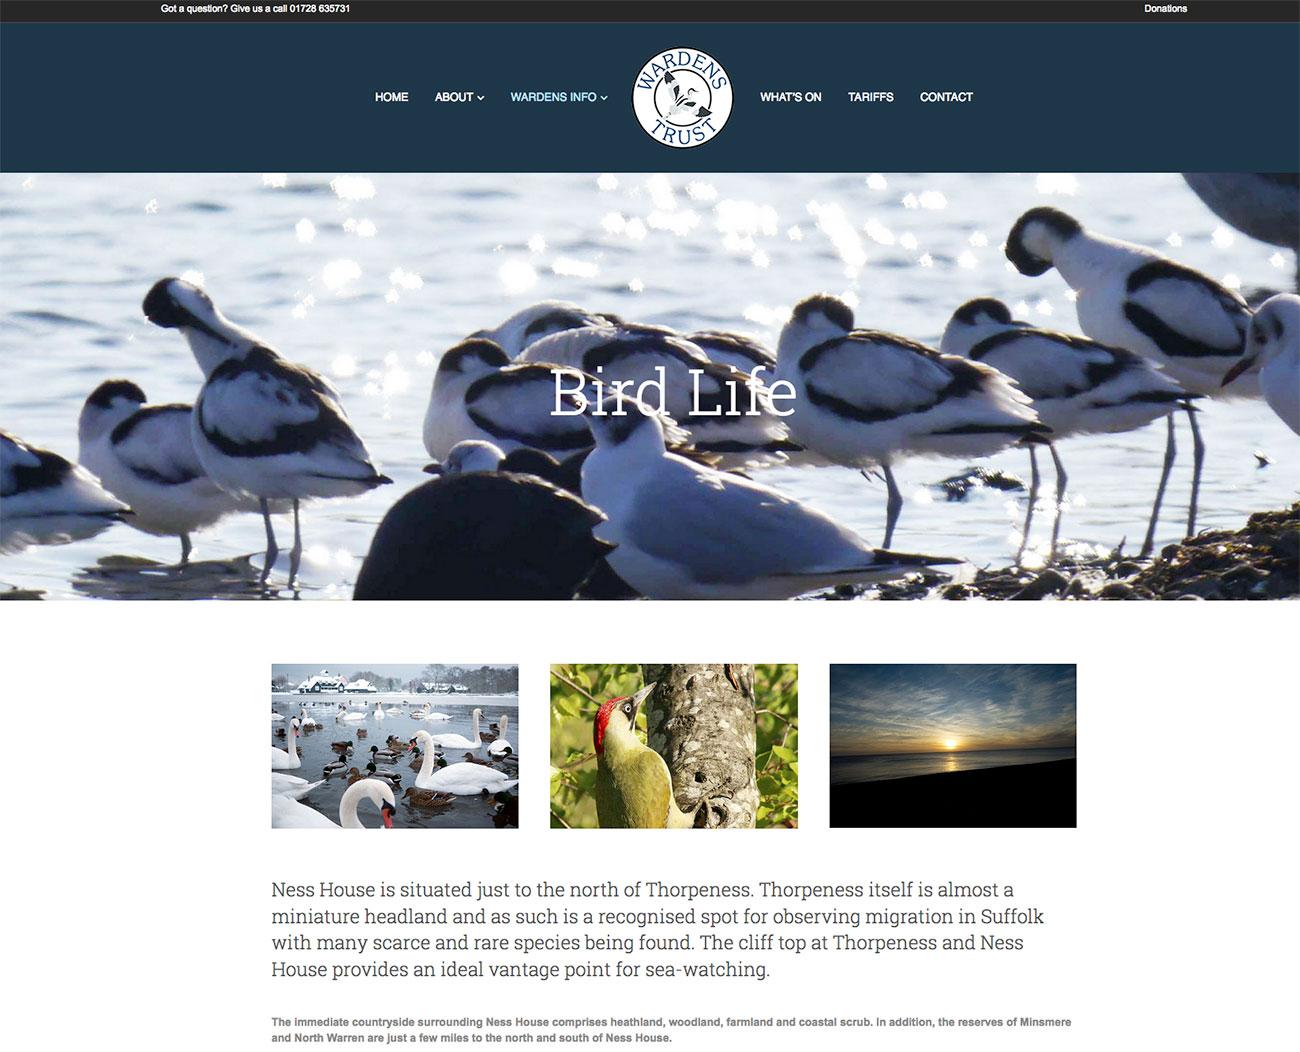 Web Design Ipswich Colchester Web Designers Charity Website